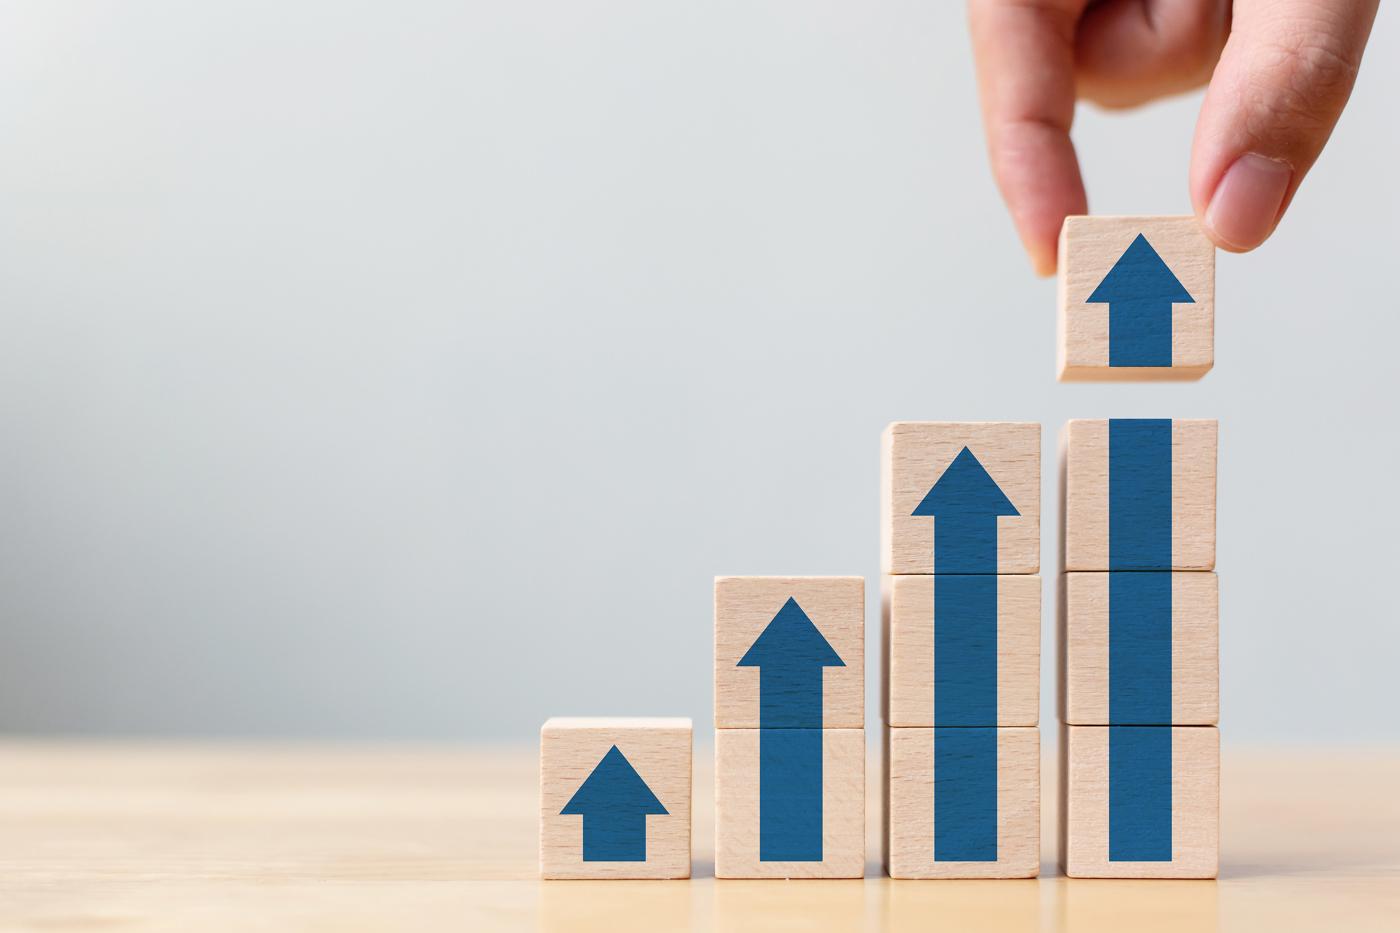 Stock price increase, stock growth, bullish trajectory